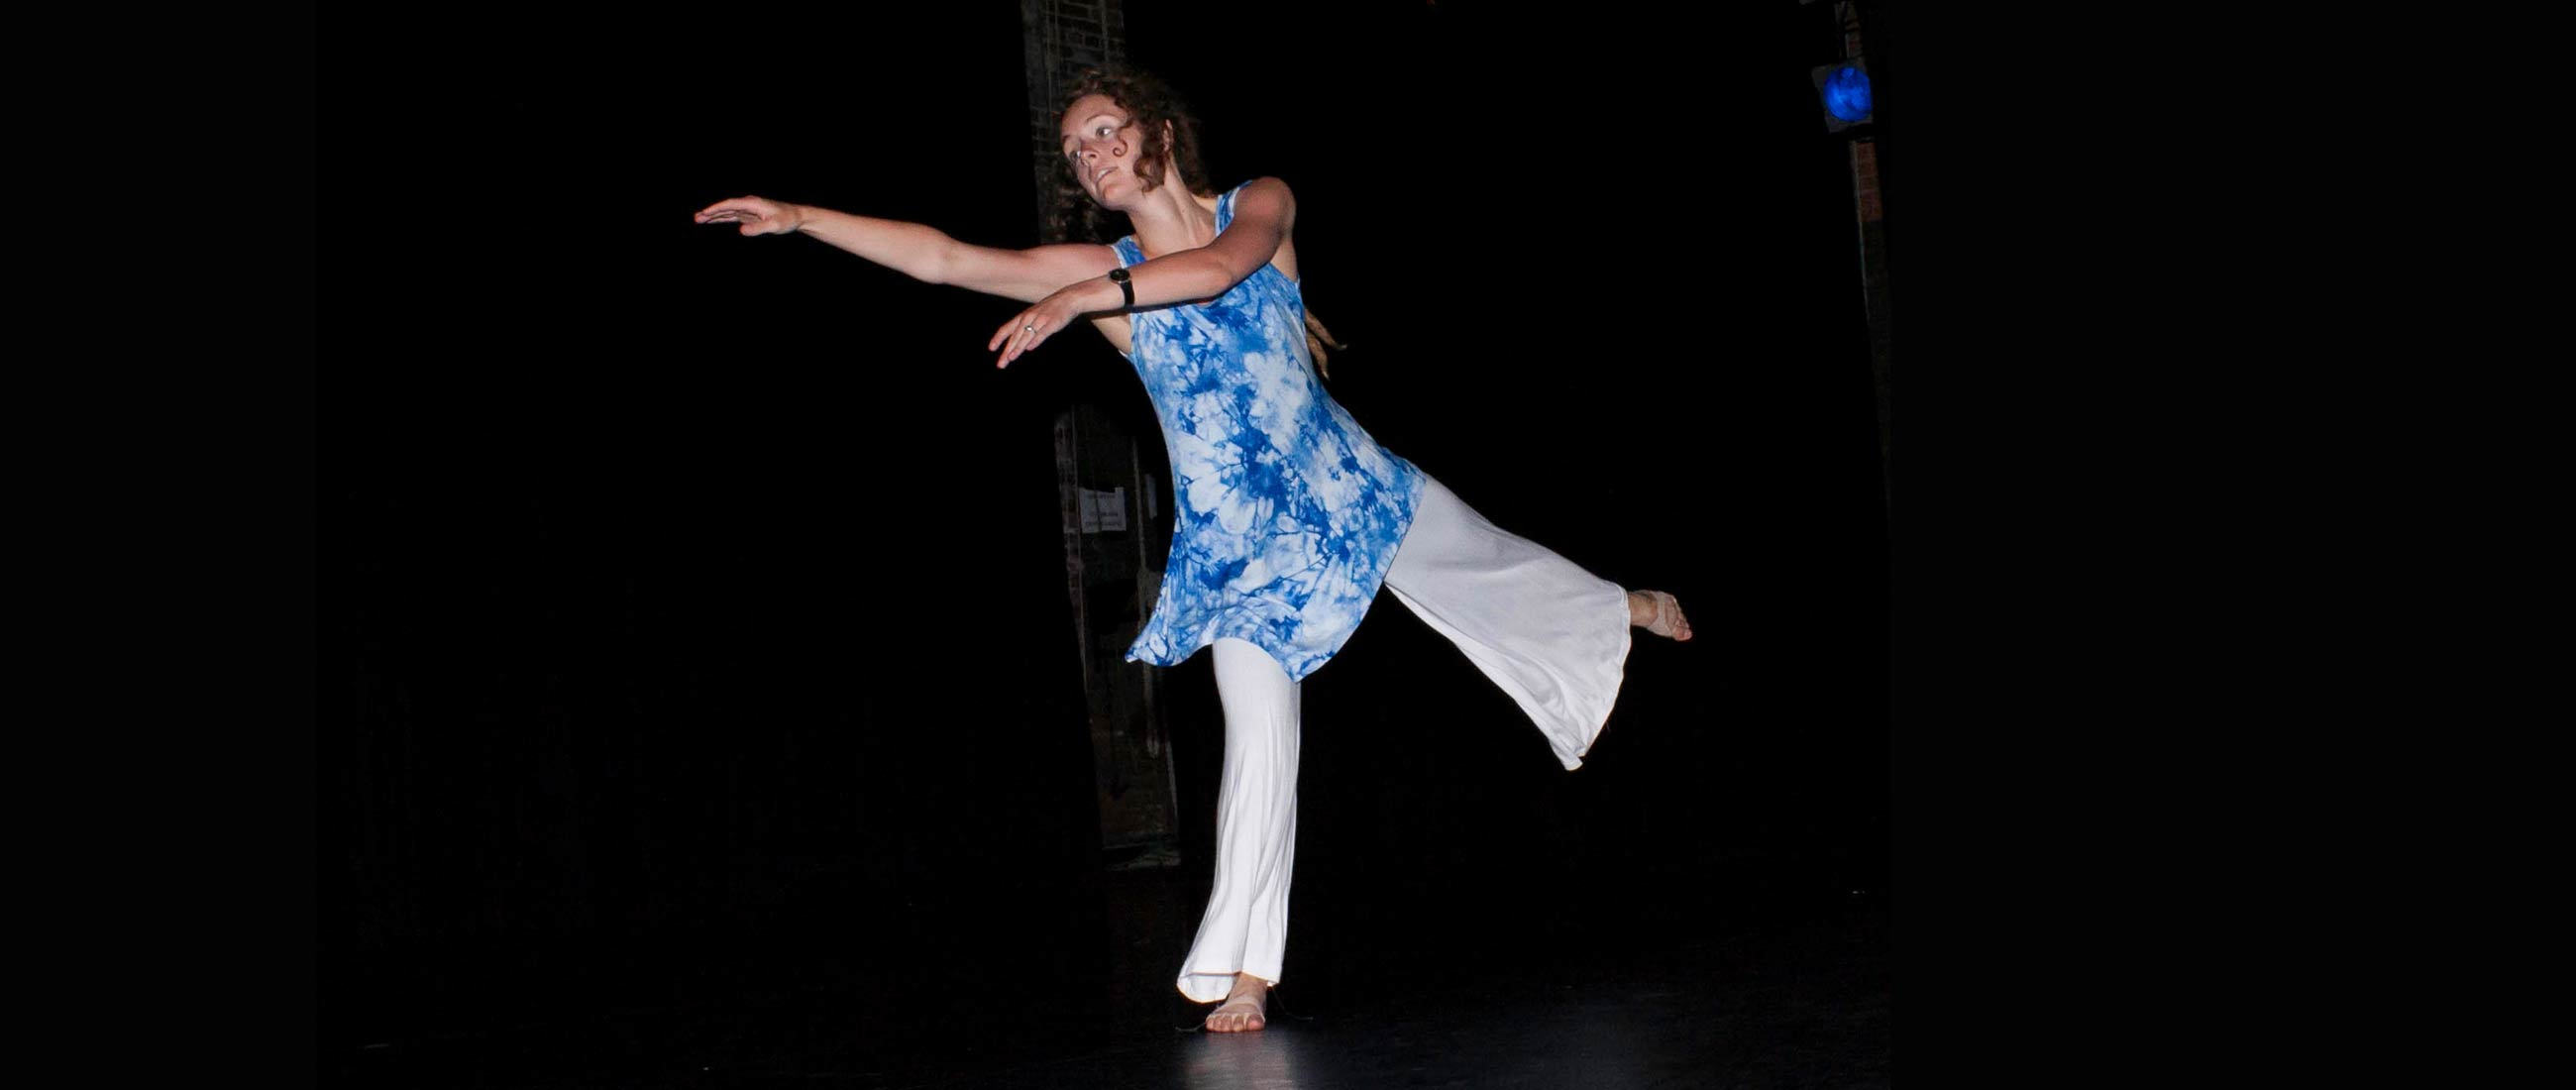 adult_contemporary_dance_school_corvallis-1.jpg